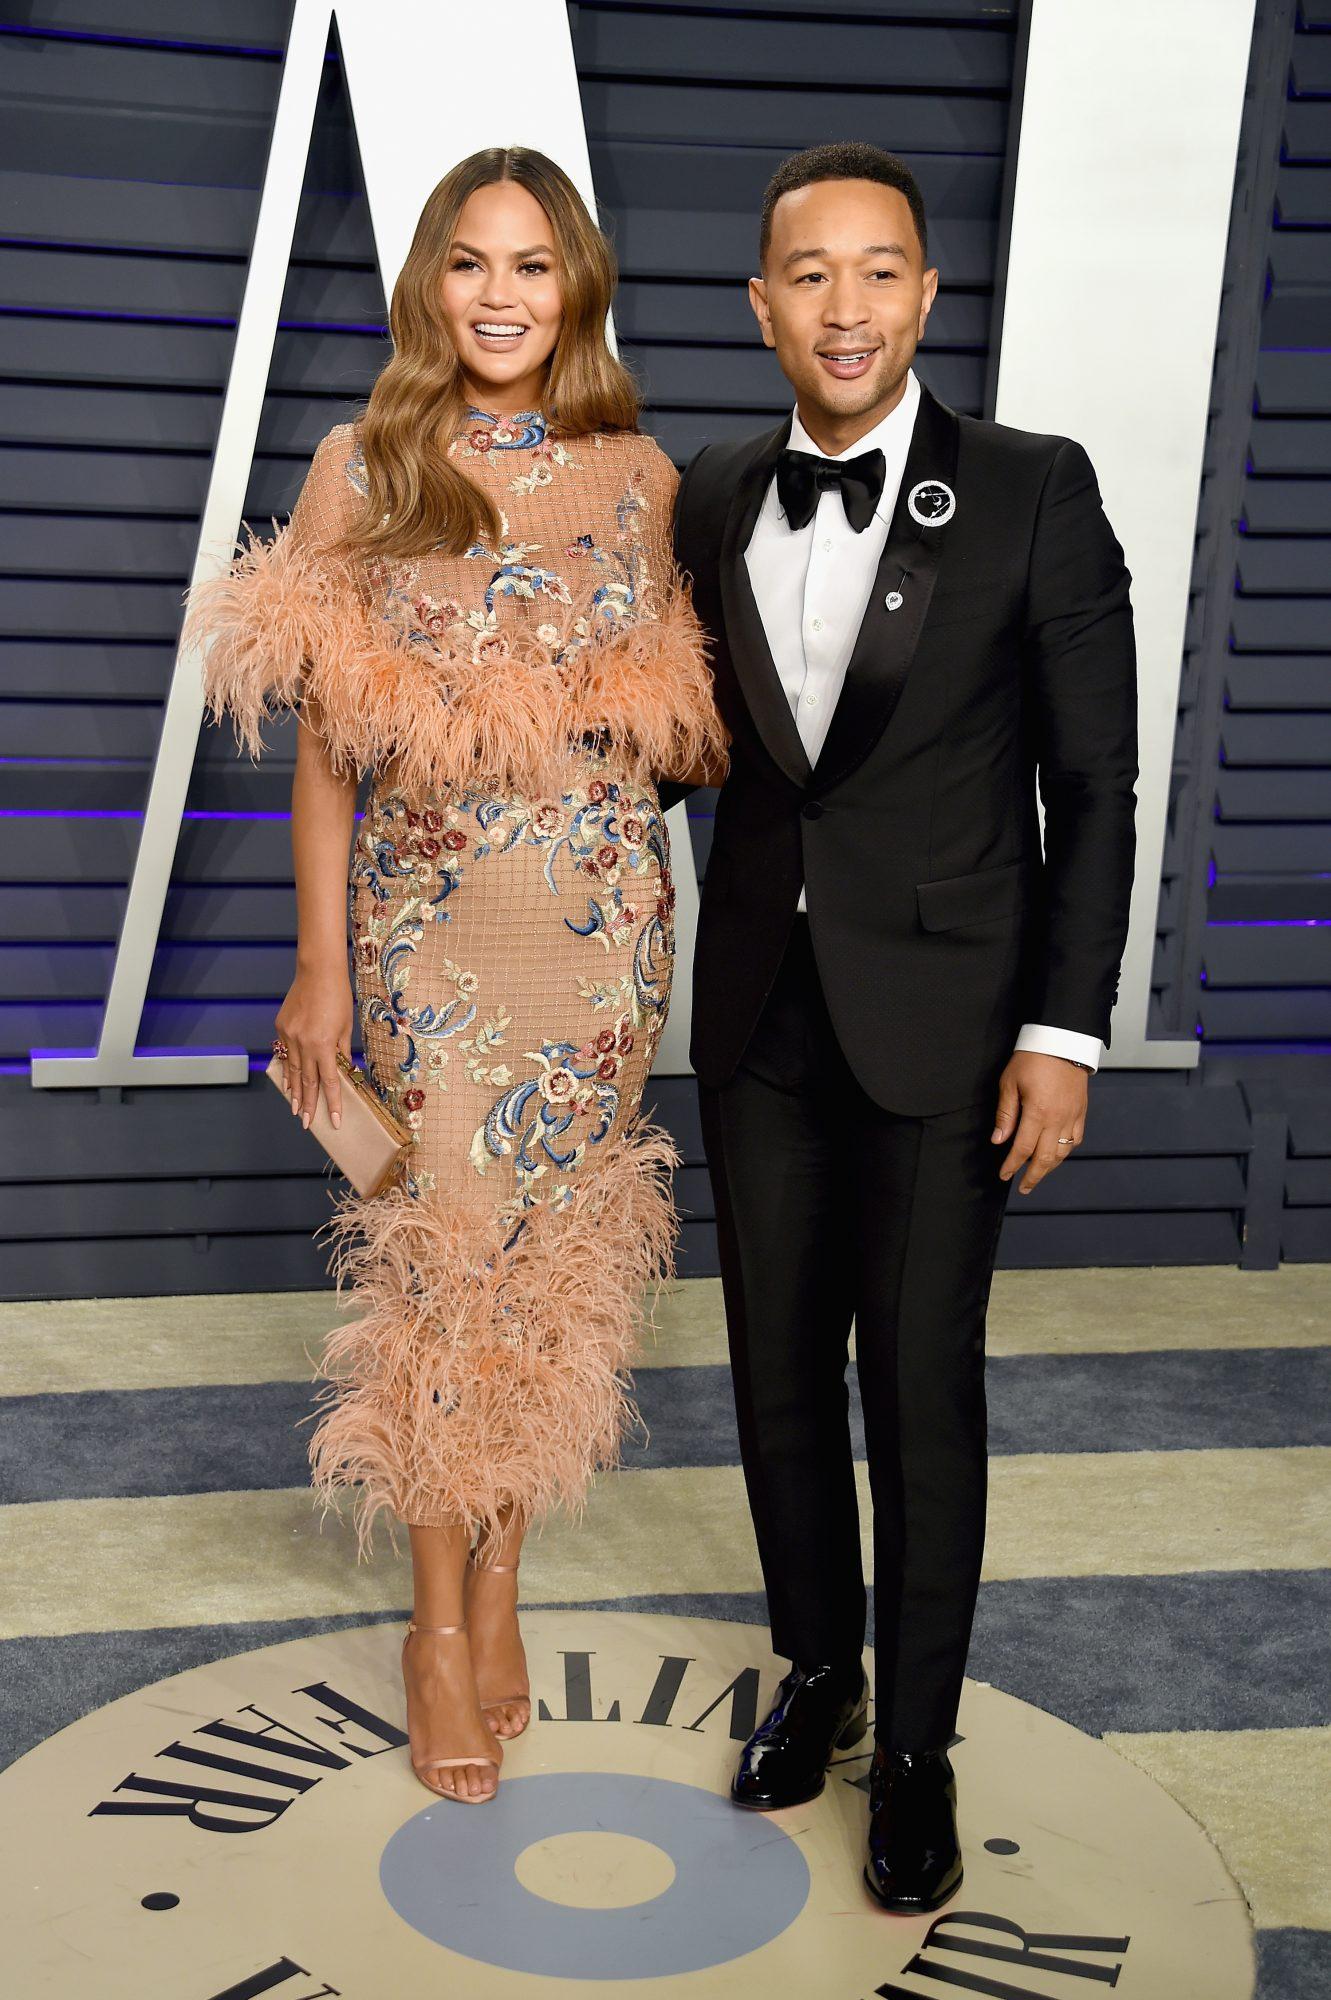 Chrissy Teigen and John Legend on the red carpet.